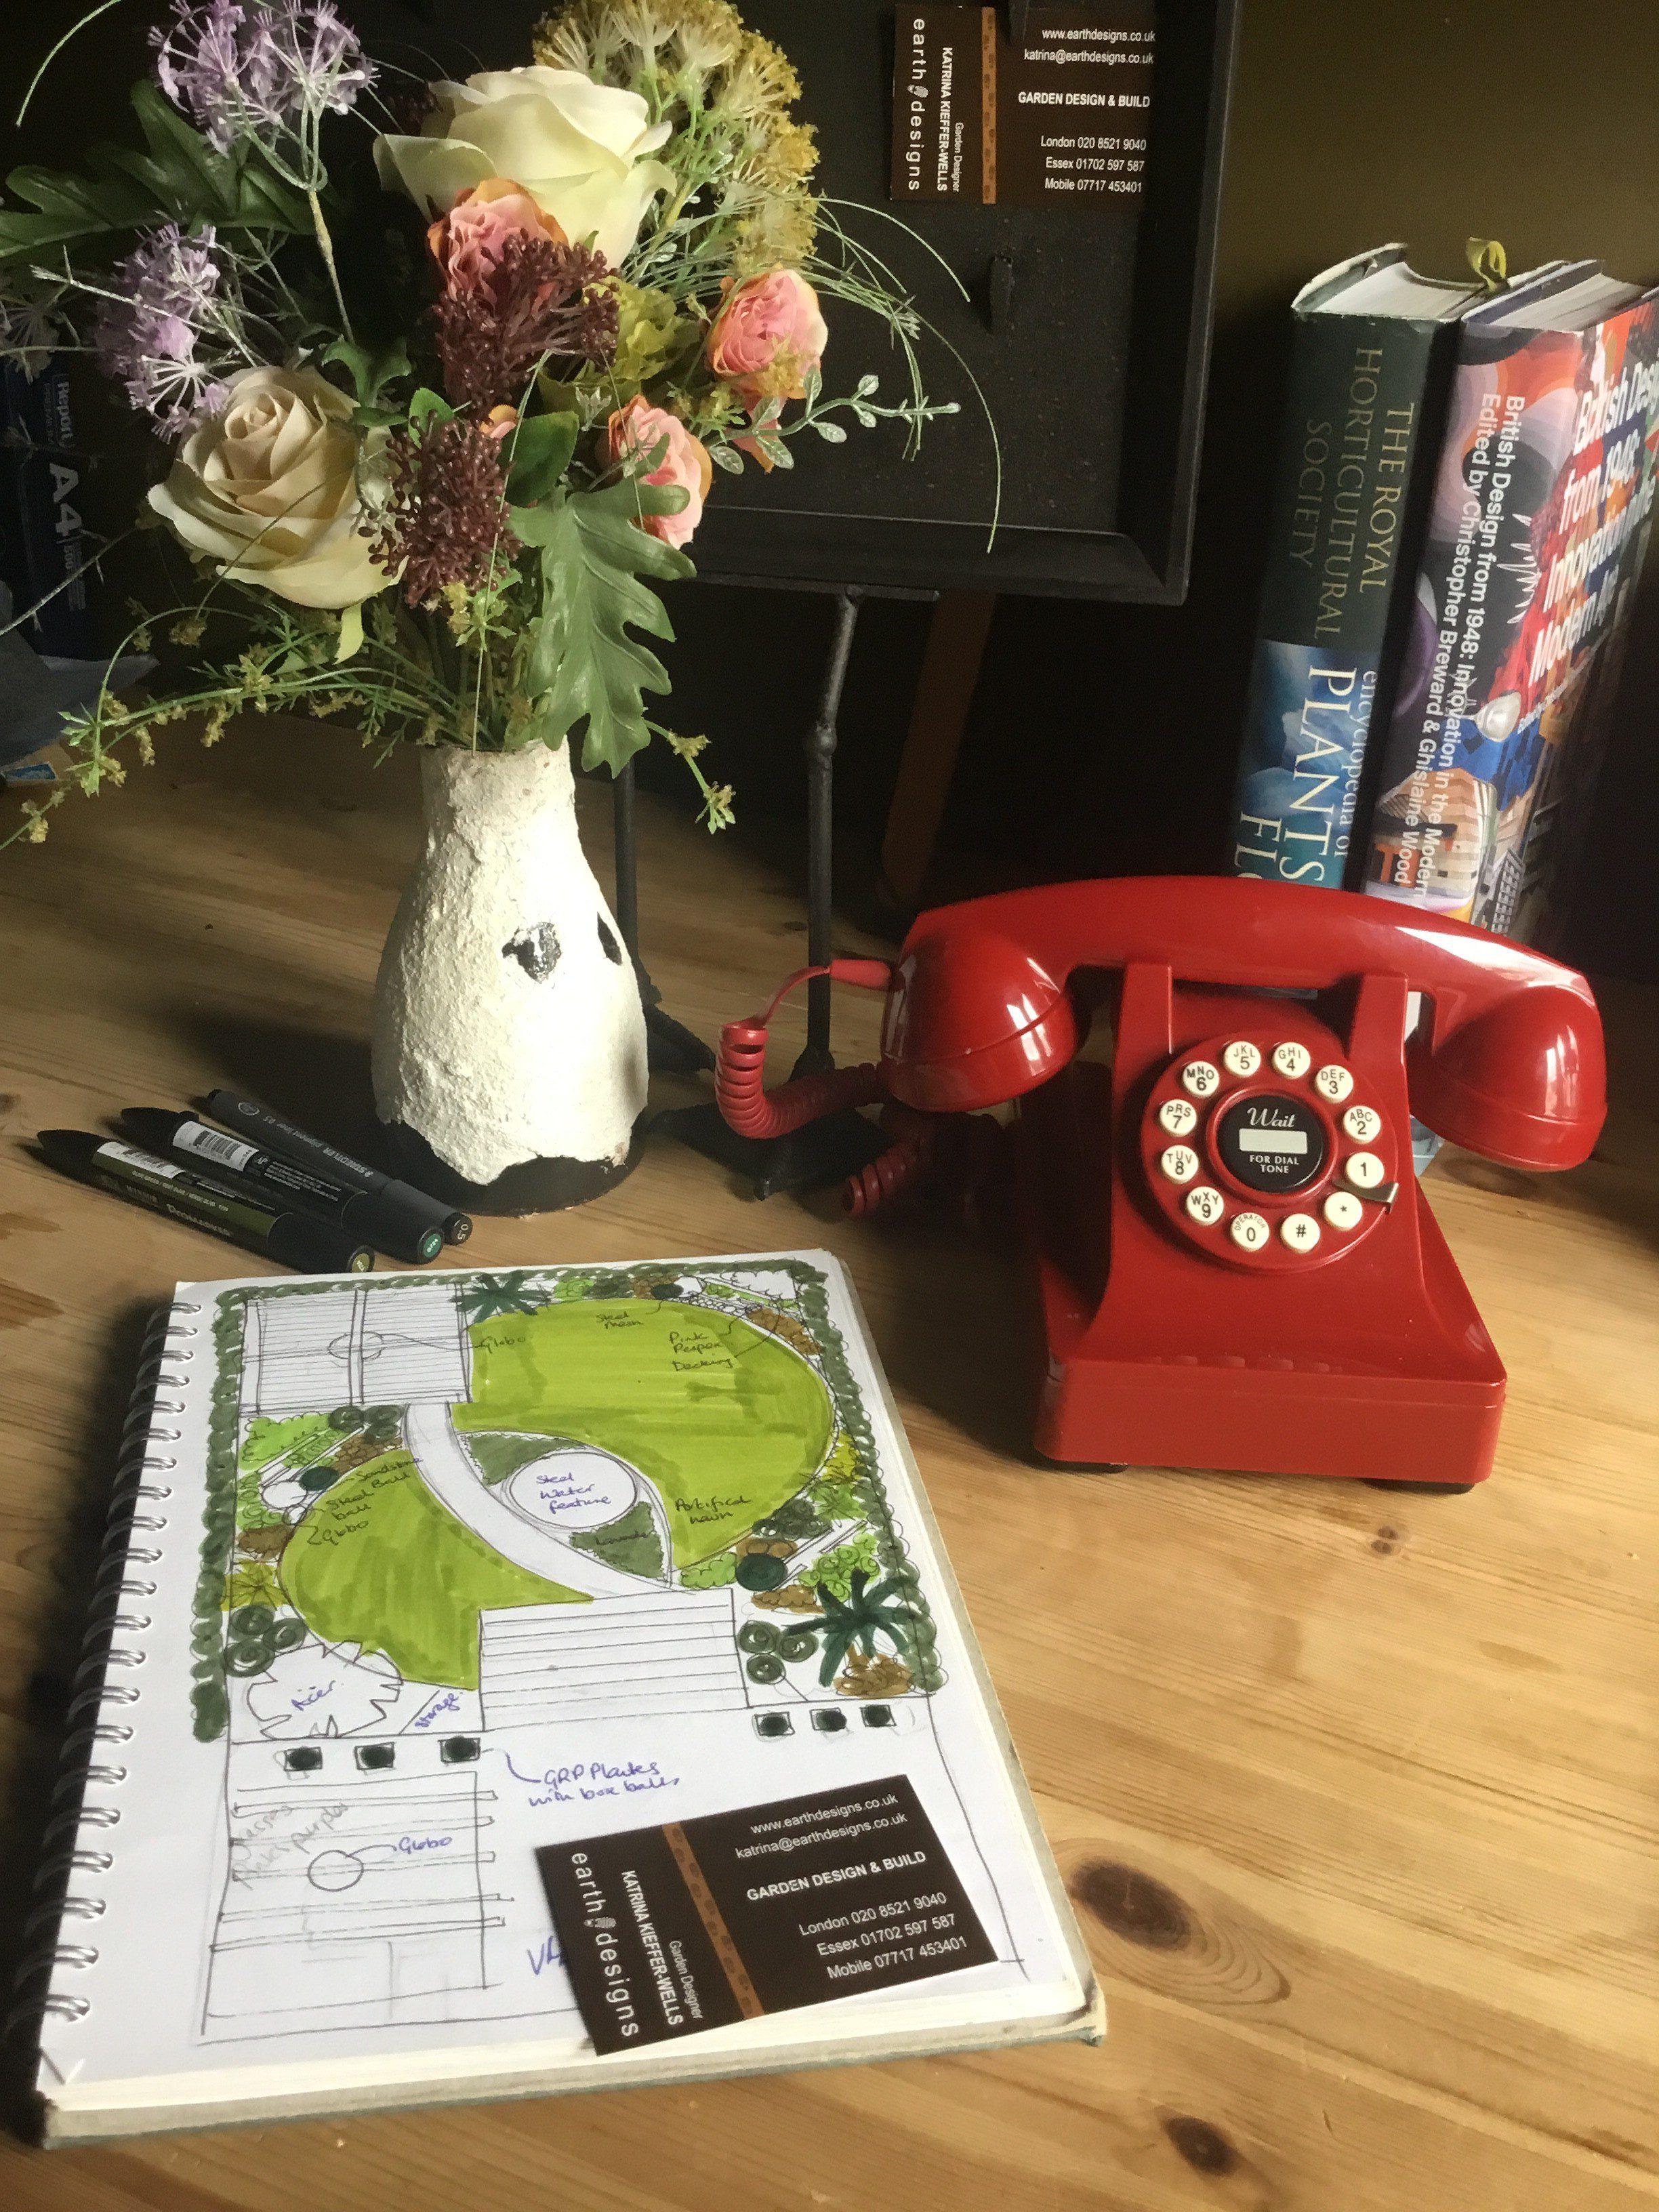 Earth Designs - garden and build